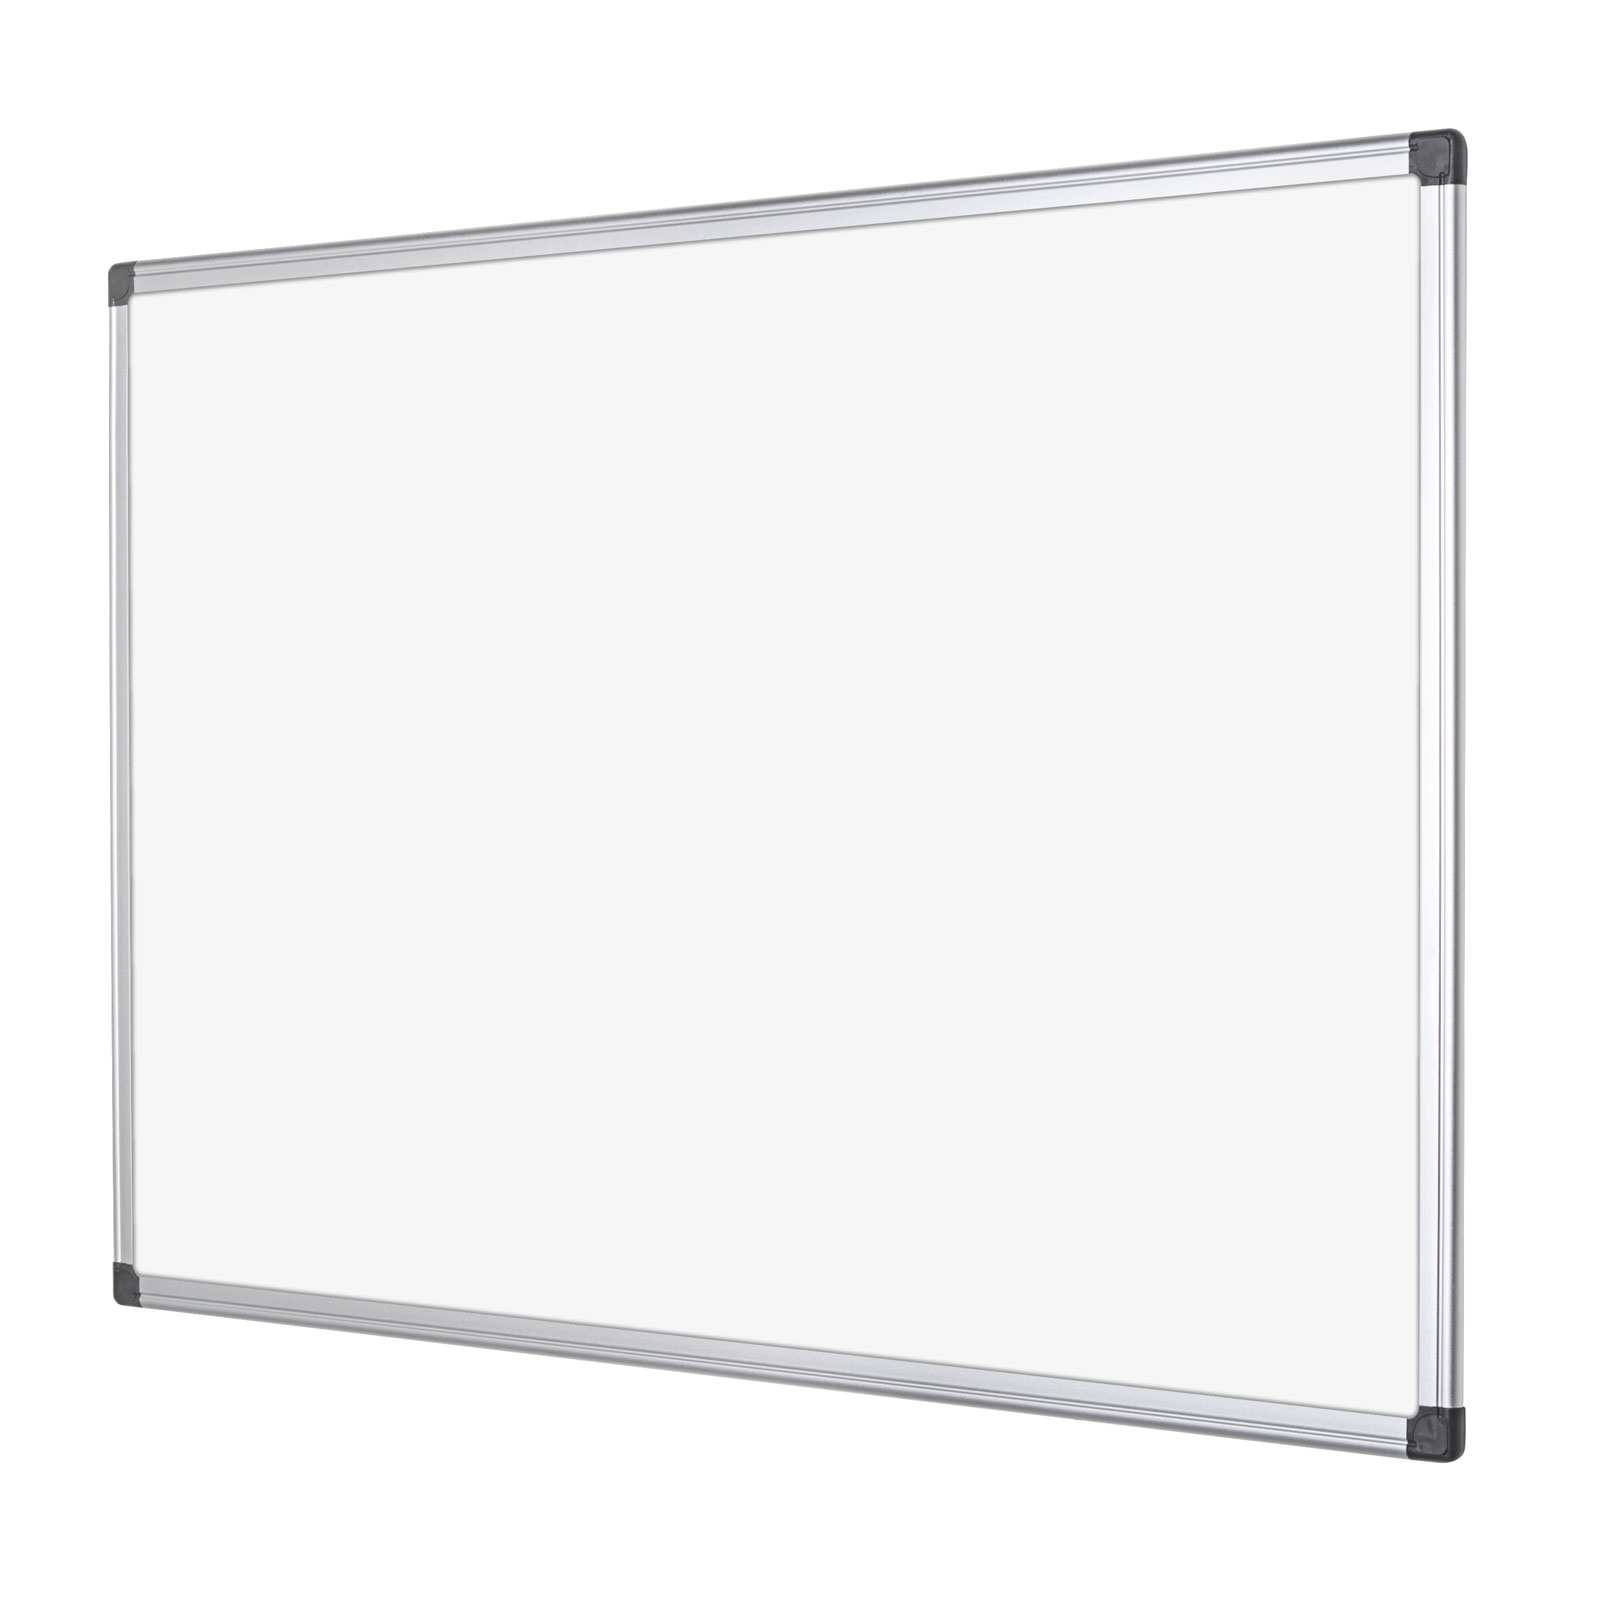 bi office tableau blanc laqu 120 x 90 cm ma0507170 achat vente tableau blanc et. Black Bedroom Furniture Sets. Home Design Ideas